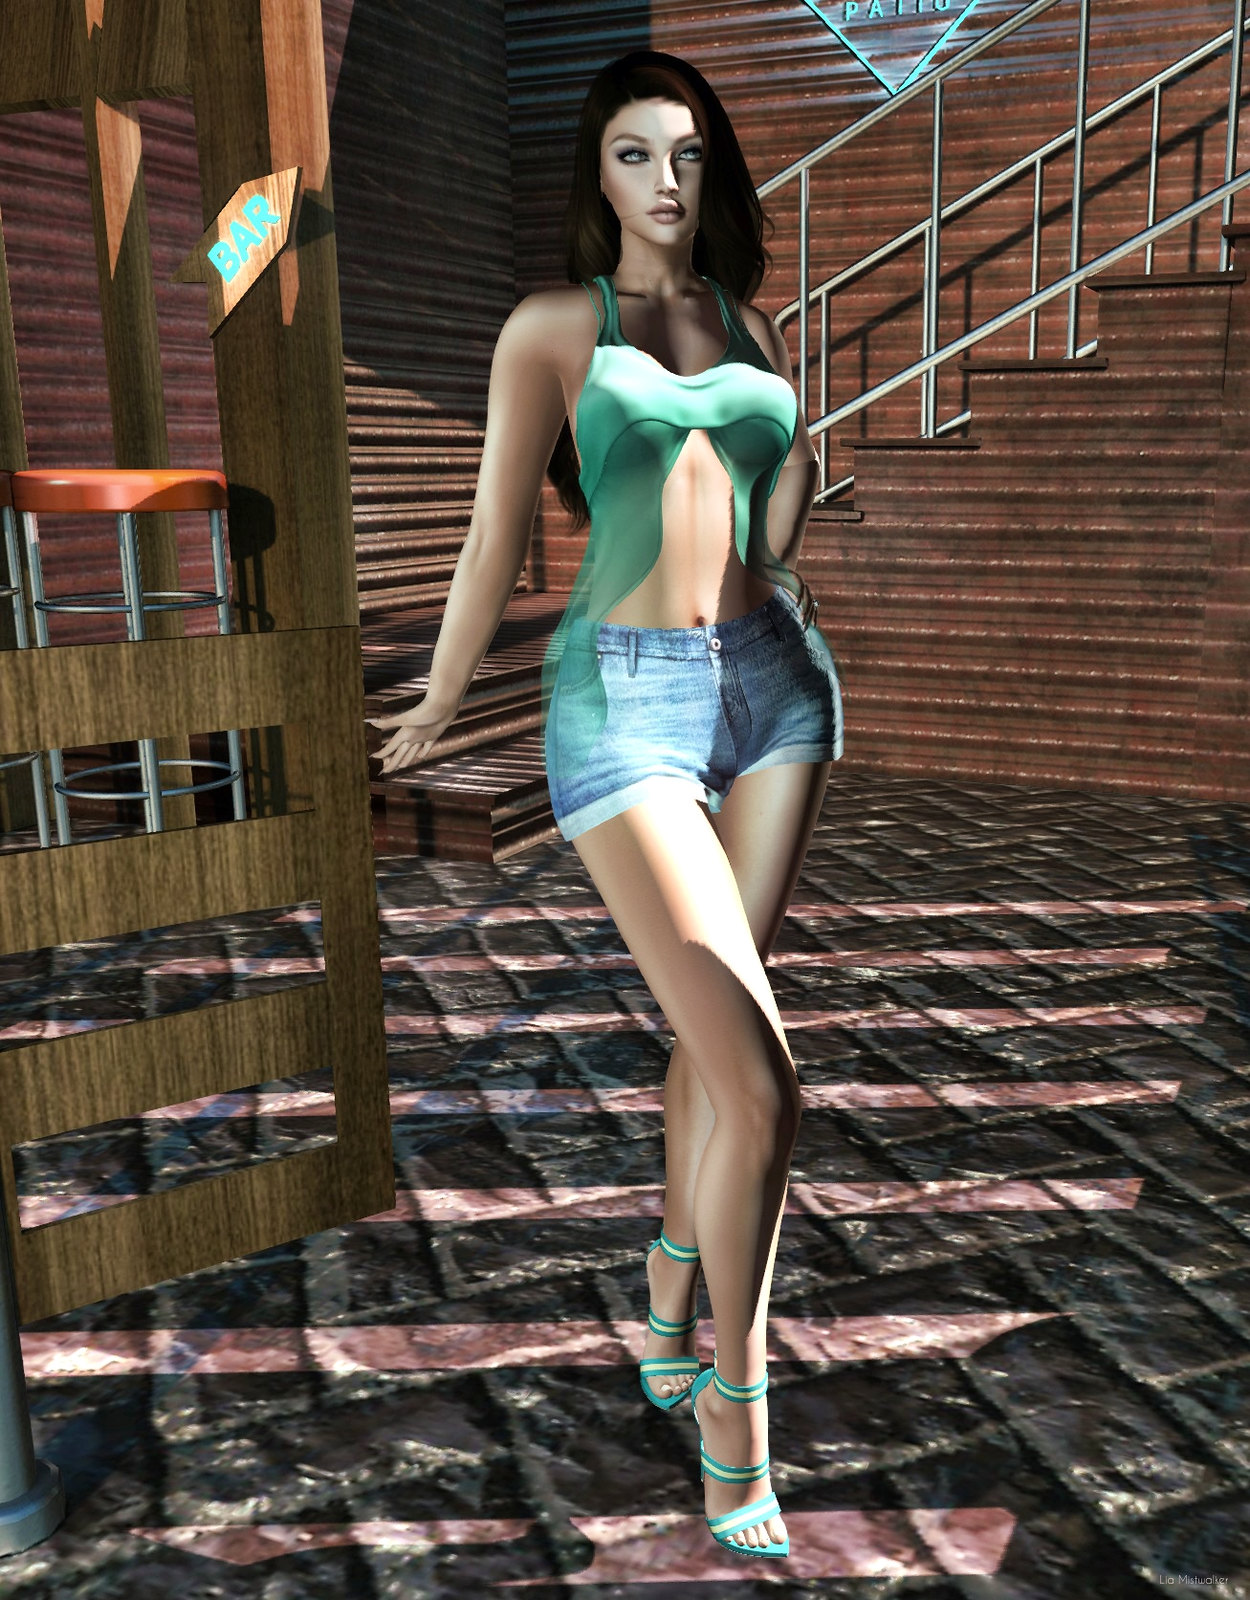 Fashion Therapy # 1280